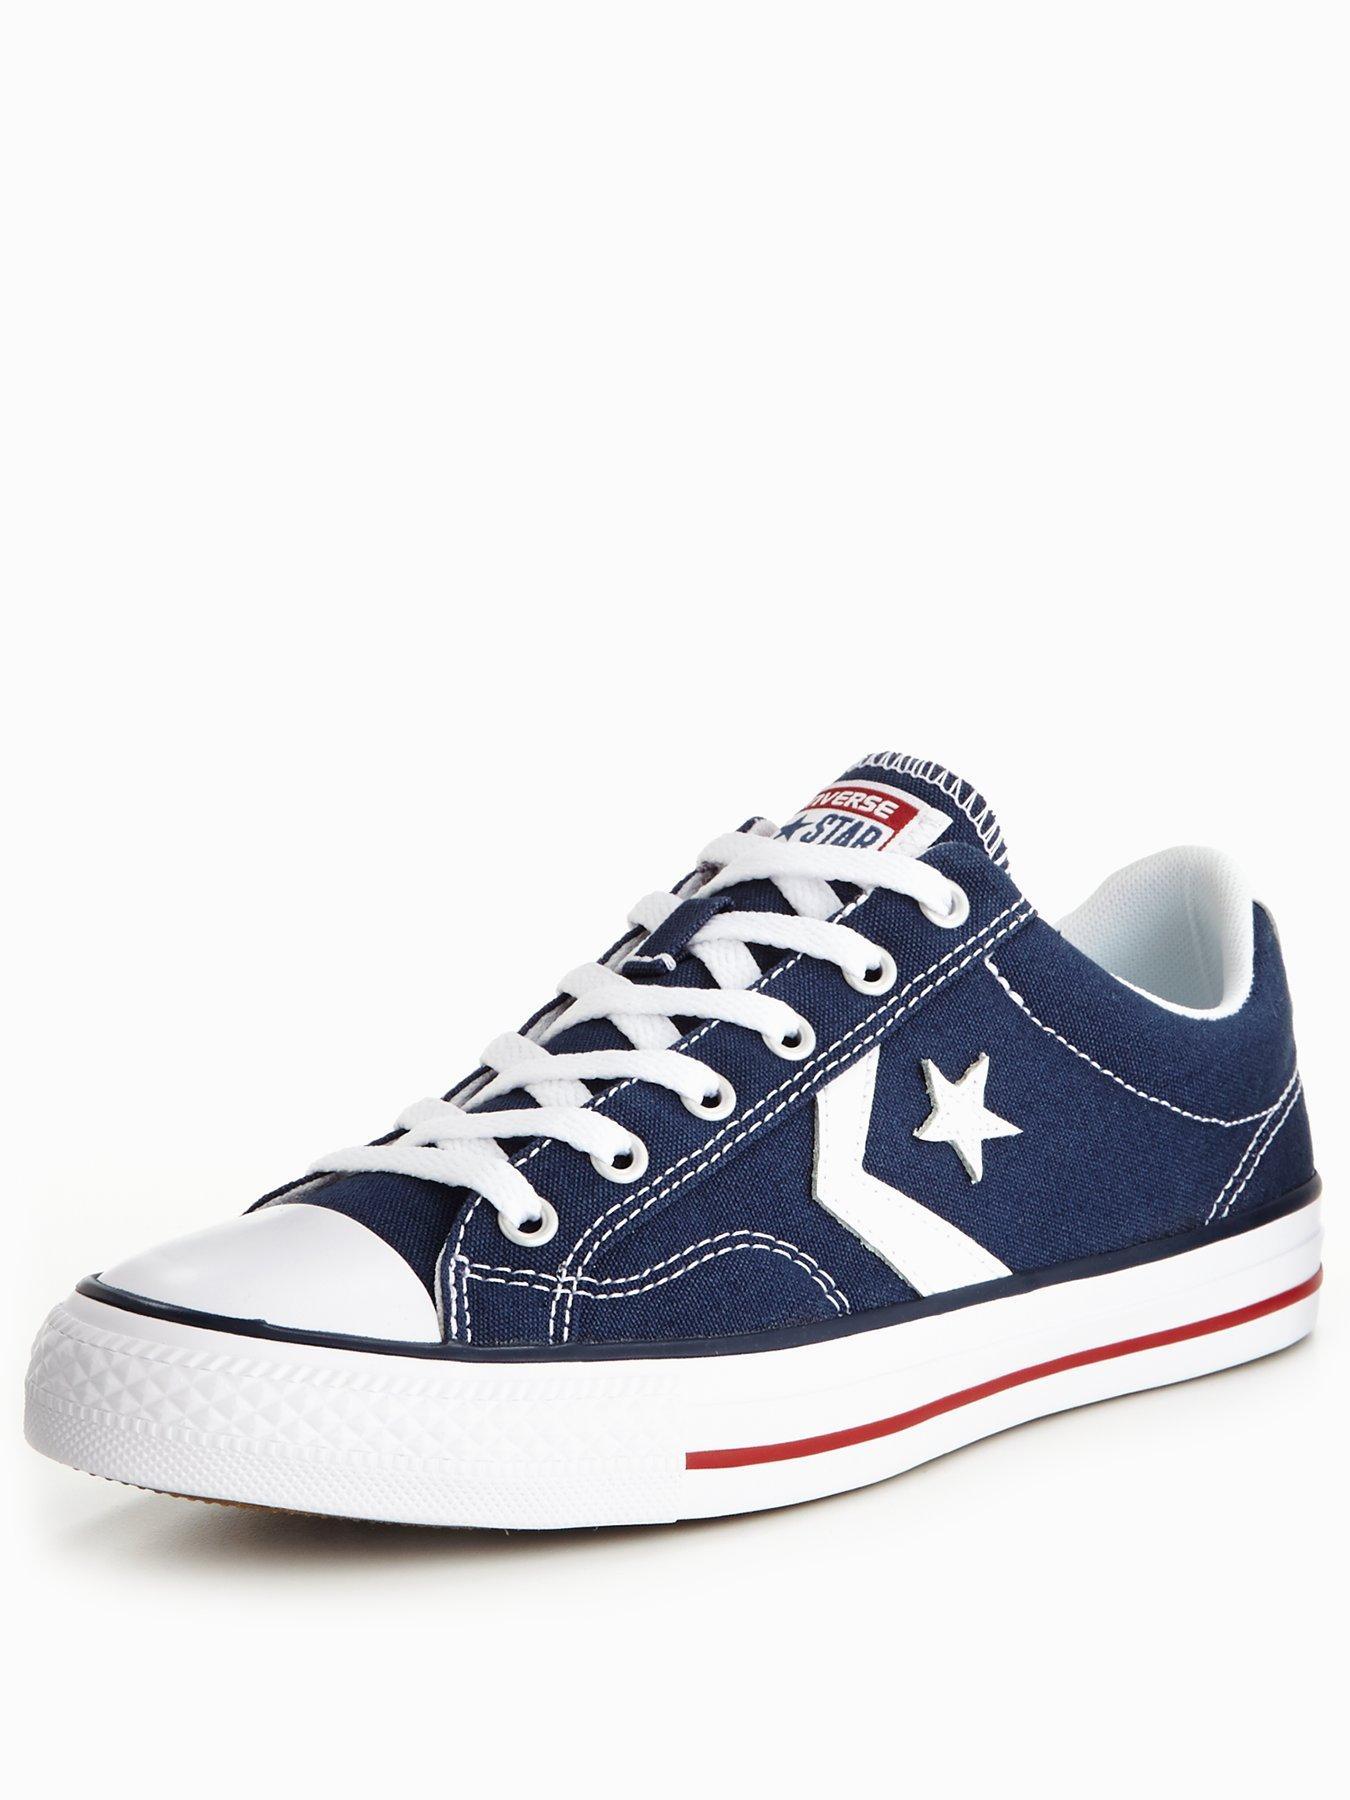 hot converse star player ox vision blue 174be e21e0 918caceca